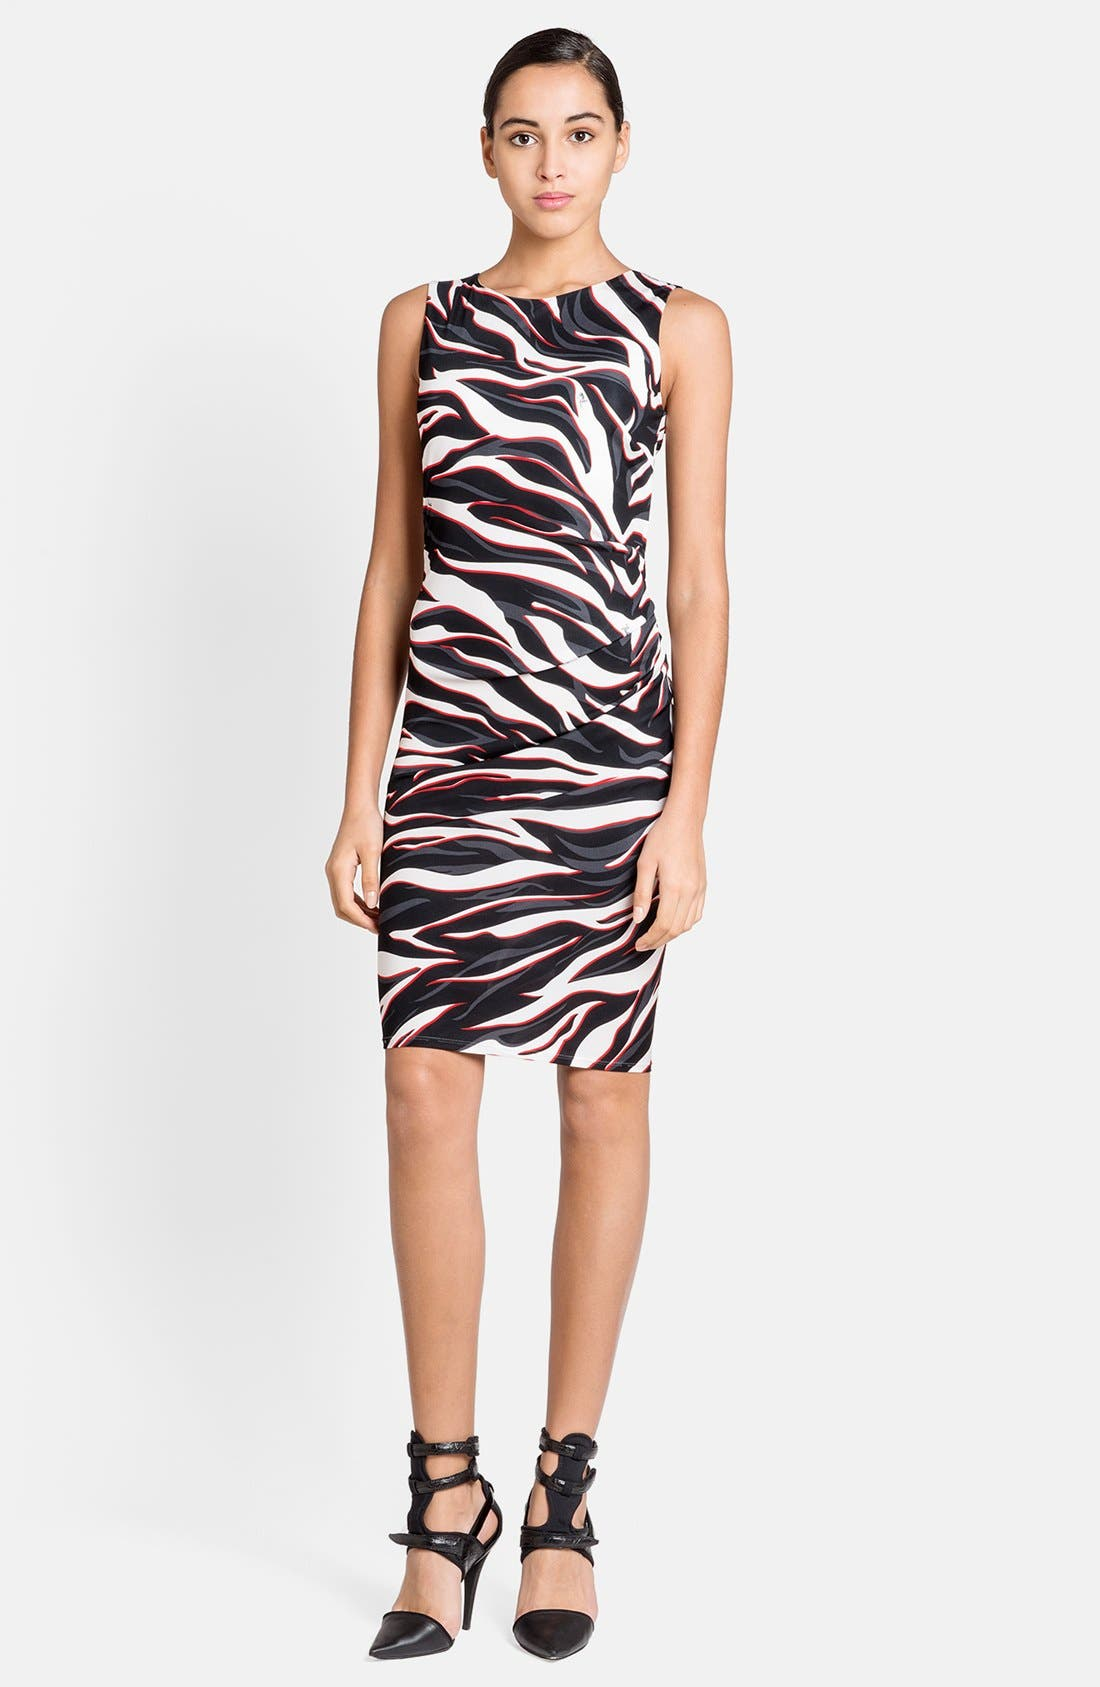 Alternate Image 1 Selected - Emilio Pucci Zebra Print Dress